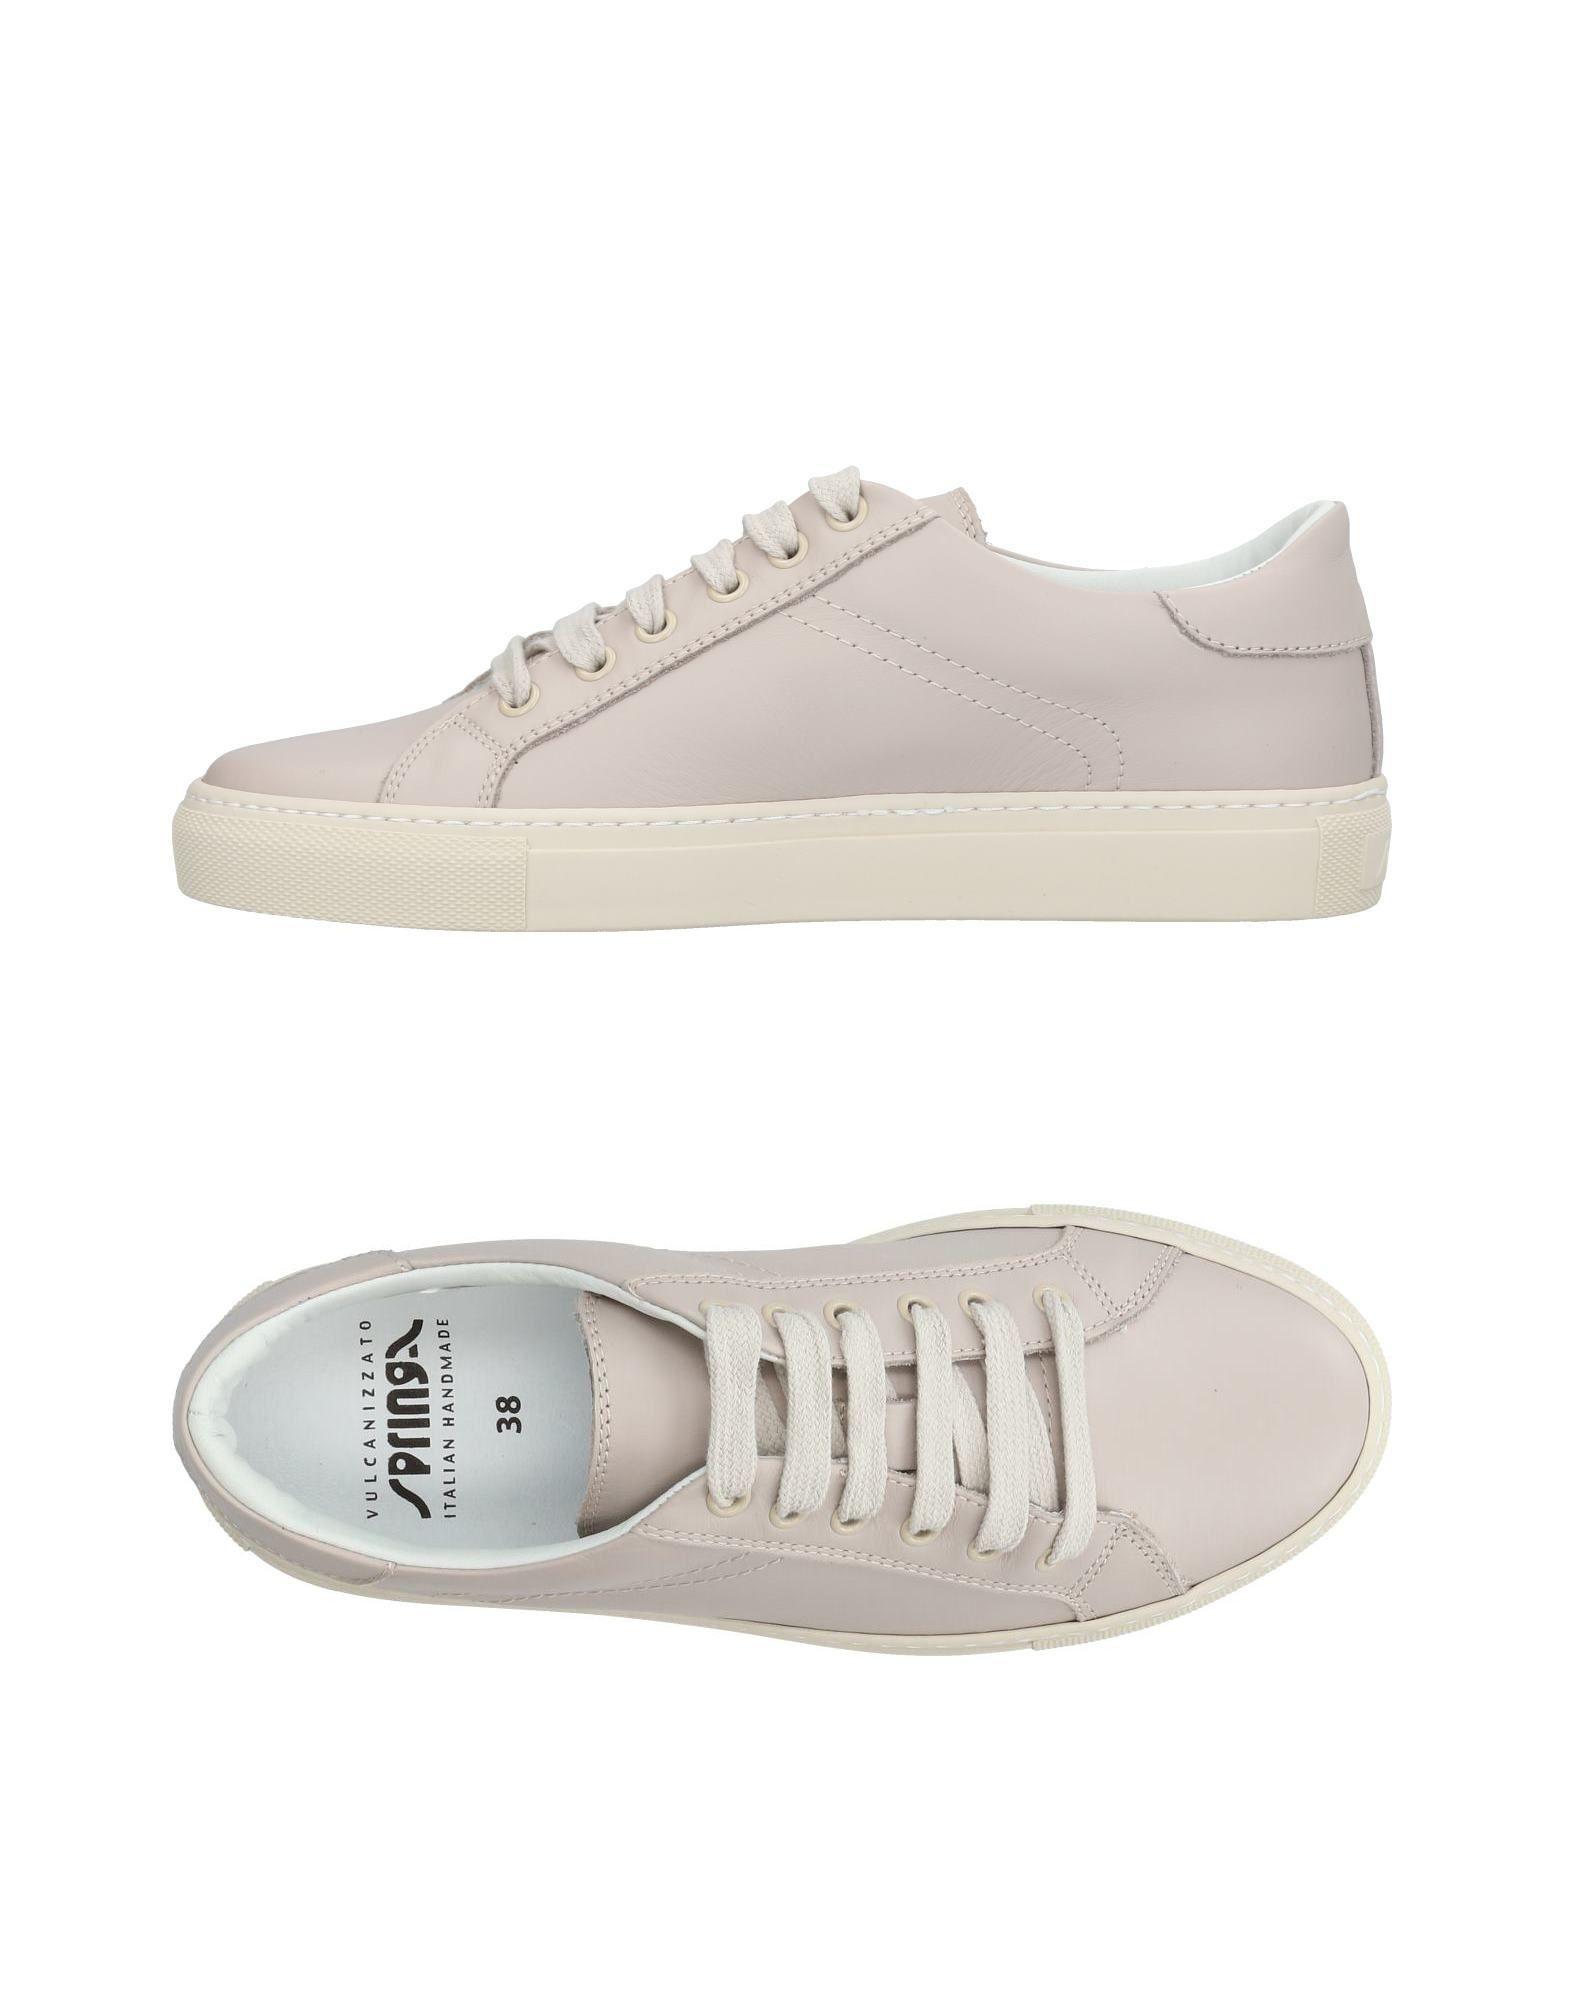 Sneakers Scarpe Springa Donna - 11456721OA Scarpe Sneakers comode e distintive 88b1ec